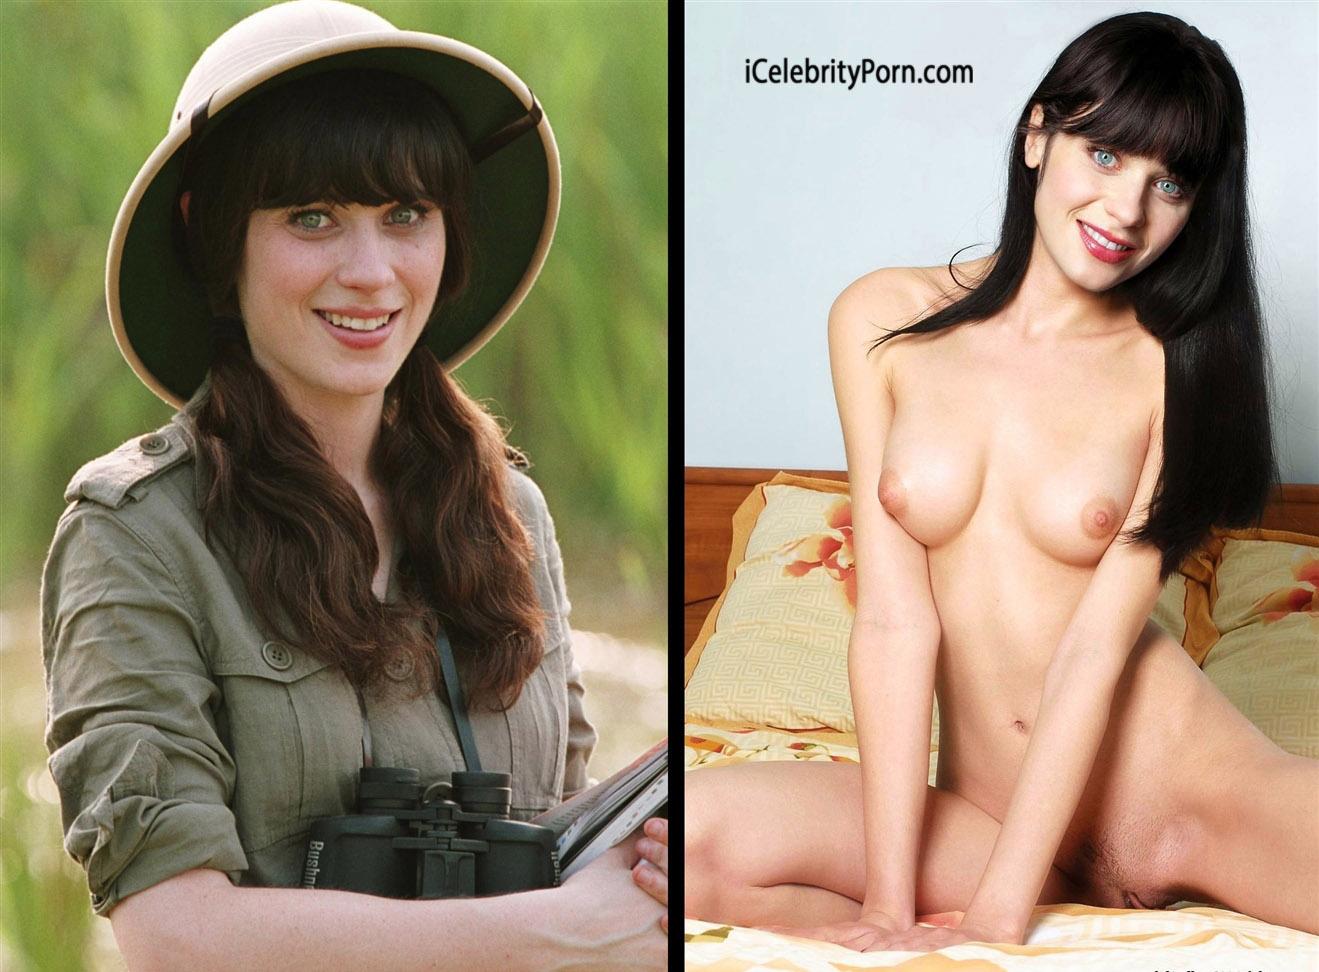 Fotos xxx de Katy Perry Filtradas Coleccion 2016-cantantes-desnudas-fotos-hackeadas-katy-perry-desnuda-video-porno